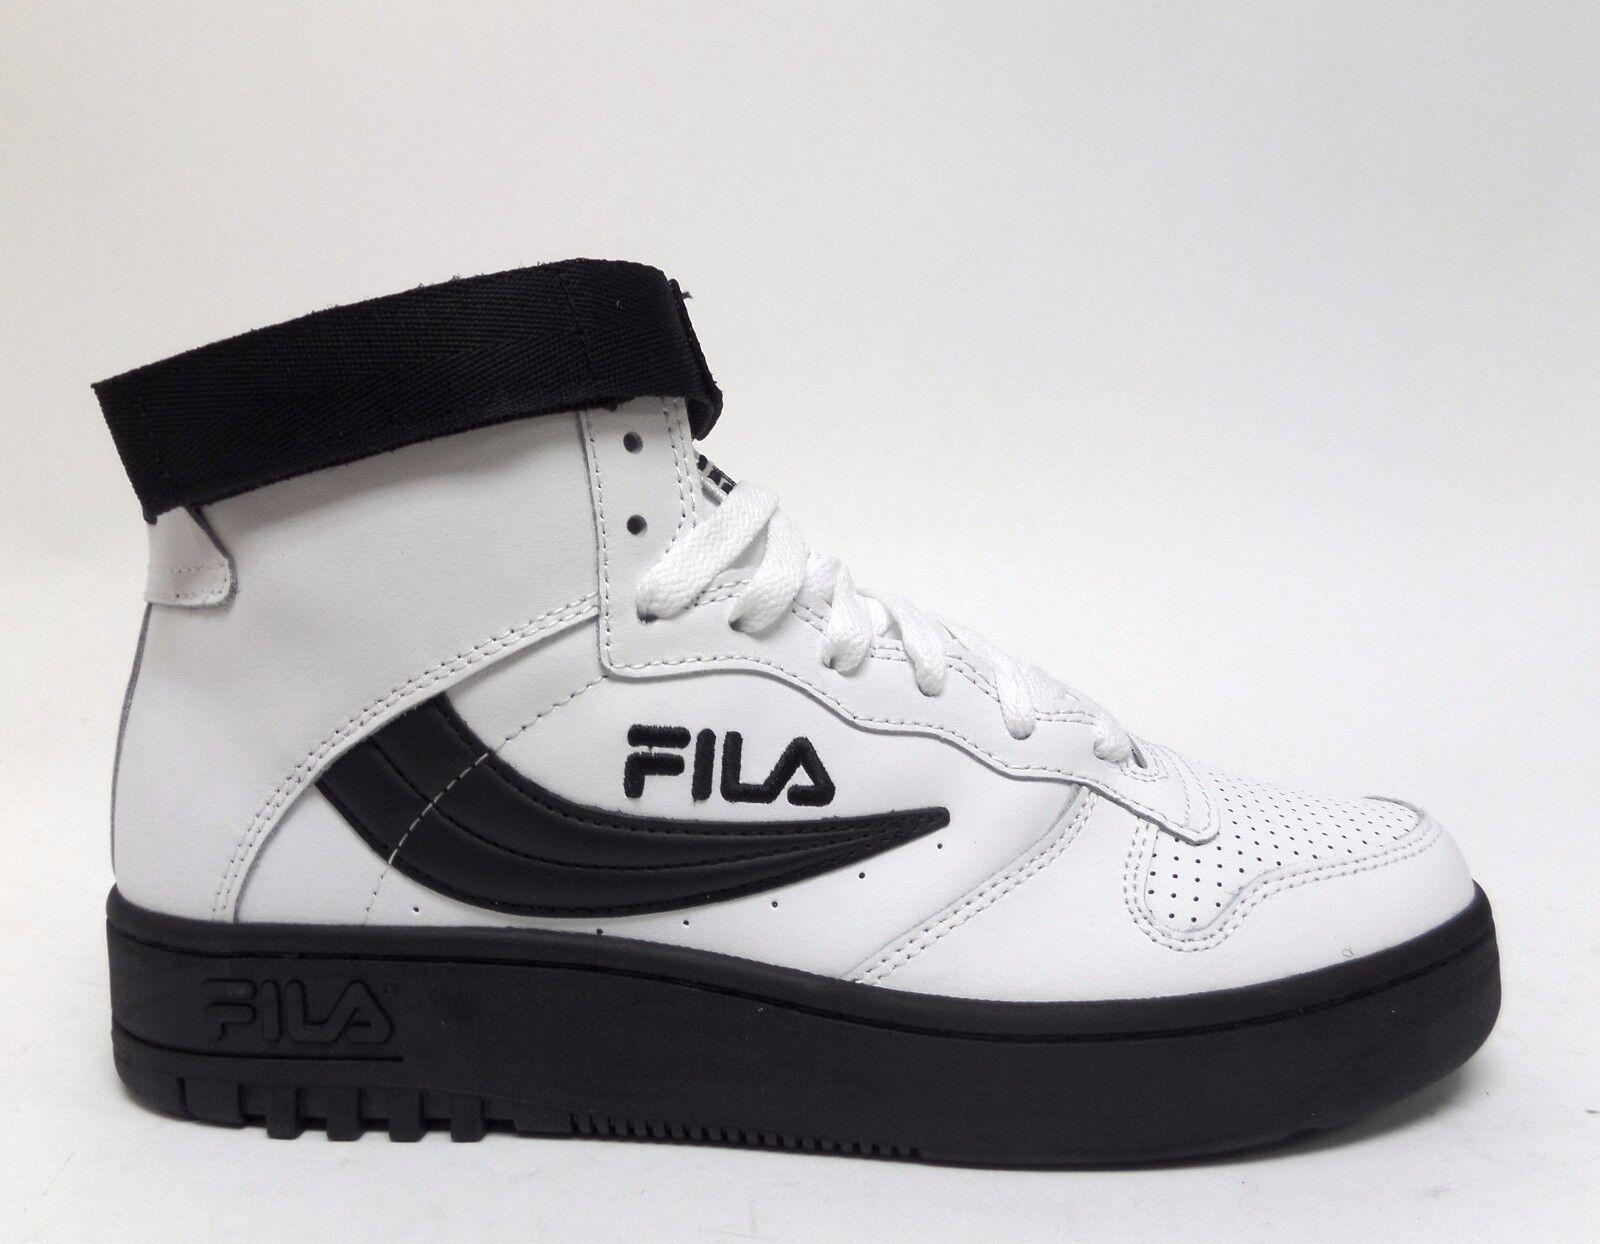 Fila deportes codigo de barras fx-100 negro hombres zapatos blanco / negro fx-100 1vb90153-112 Wild Casual Shoes a3930f